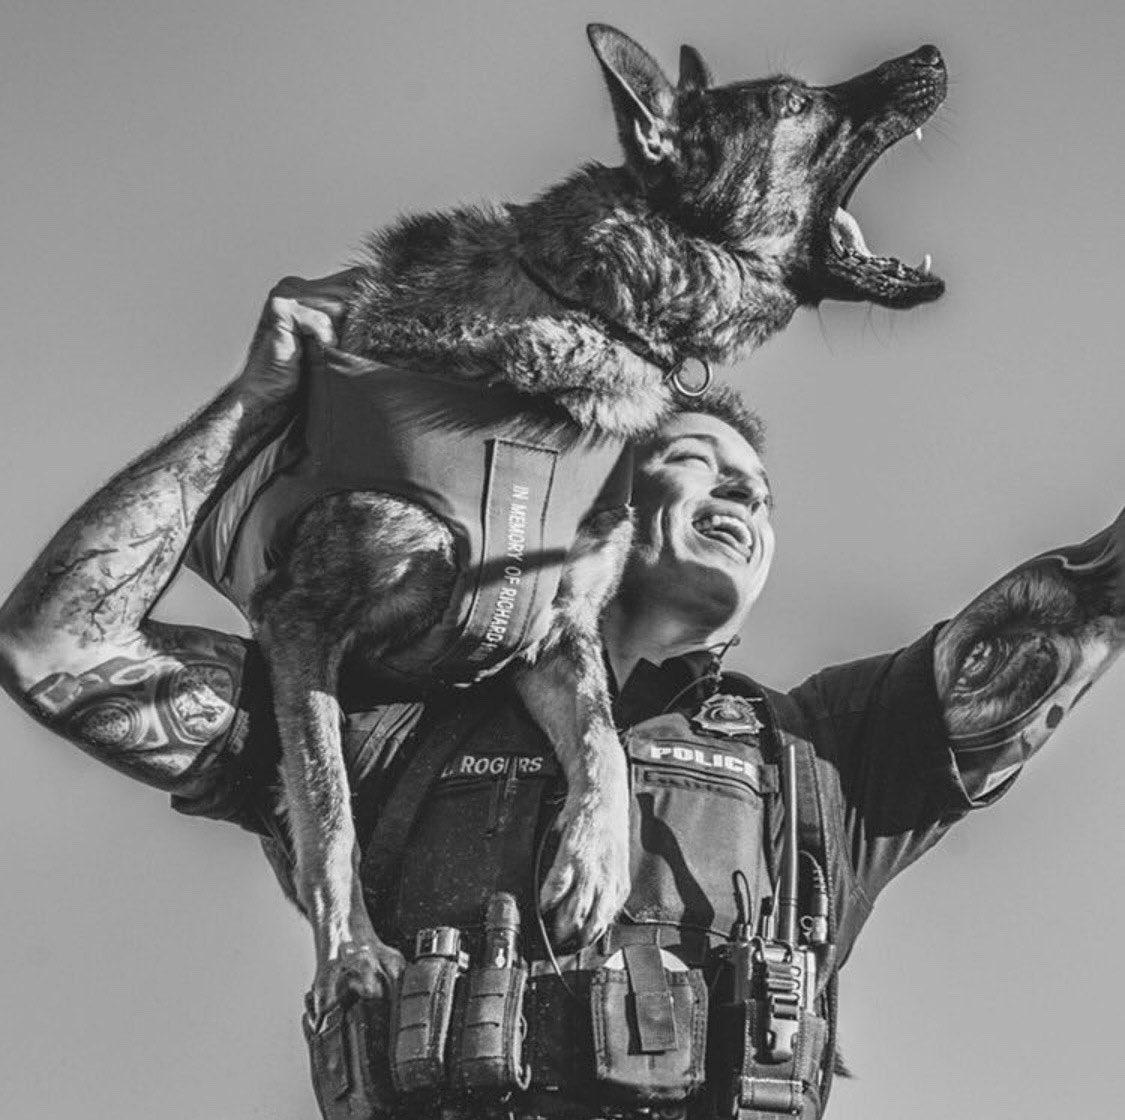 Mans best friend |📷: @k9_gunther| + + #taco #highspeed #highspeedgear #HSGI #theoriginaltaco #OGTaco #realworld #lawenforcement #police #thinblueline #gunstagram #tacopouches #tactical #tacticool #policegear #protectandserve #supportheblue https://t.co/weasSTdrPo